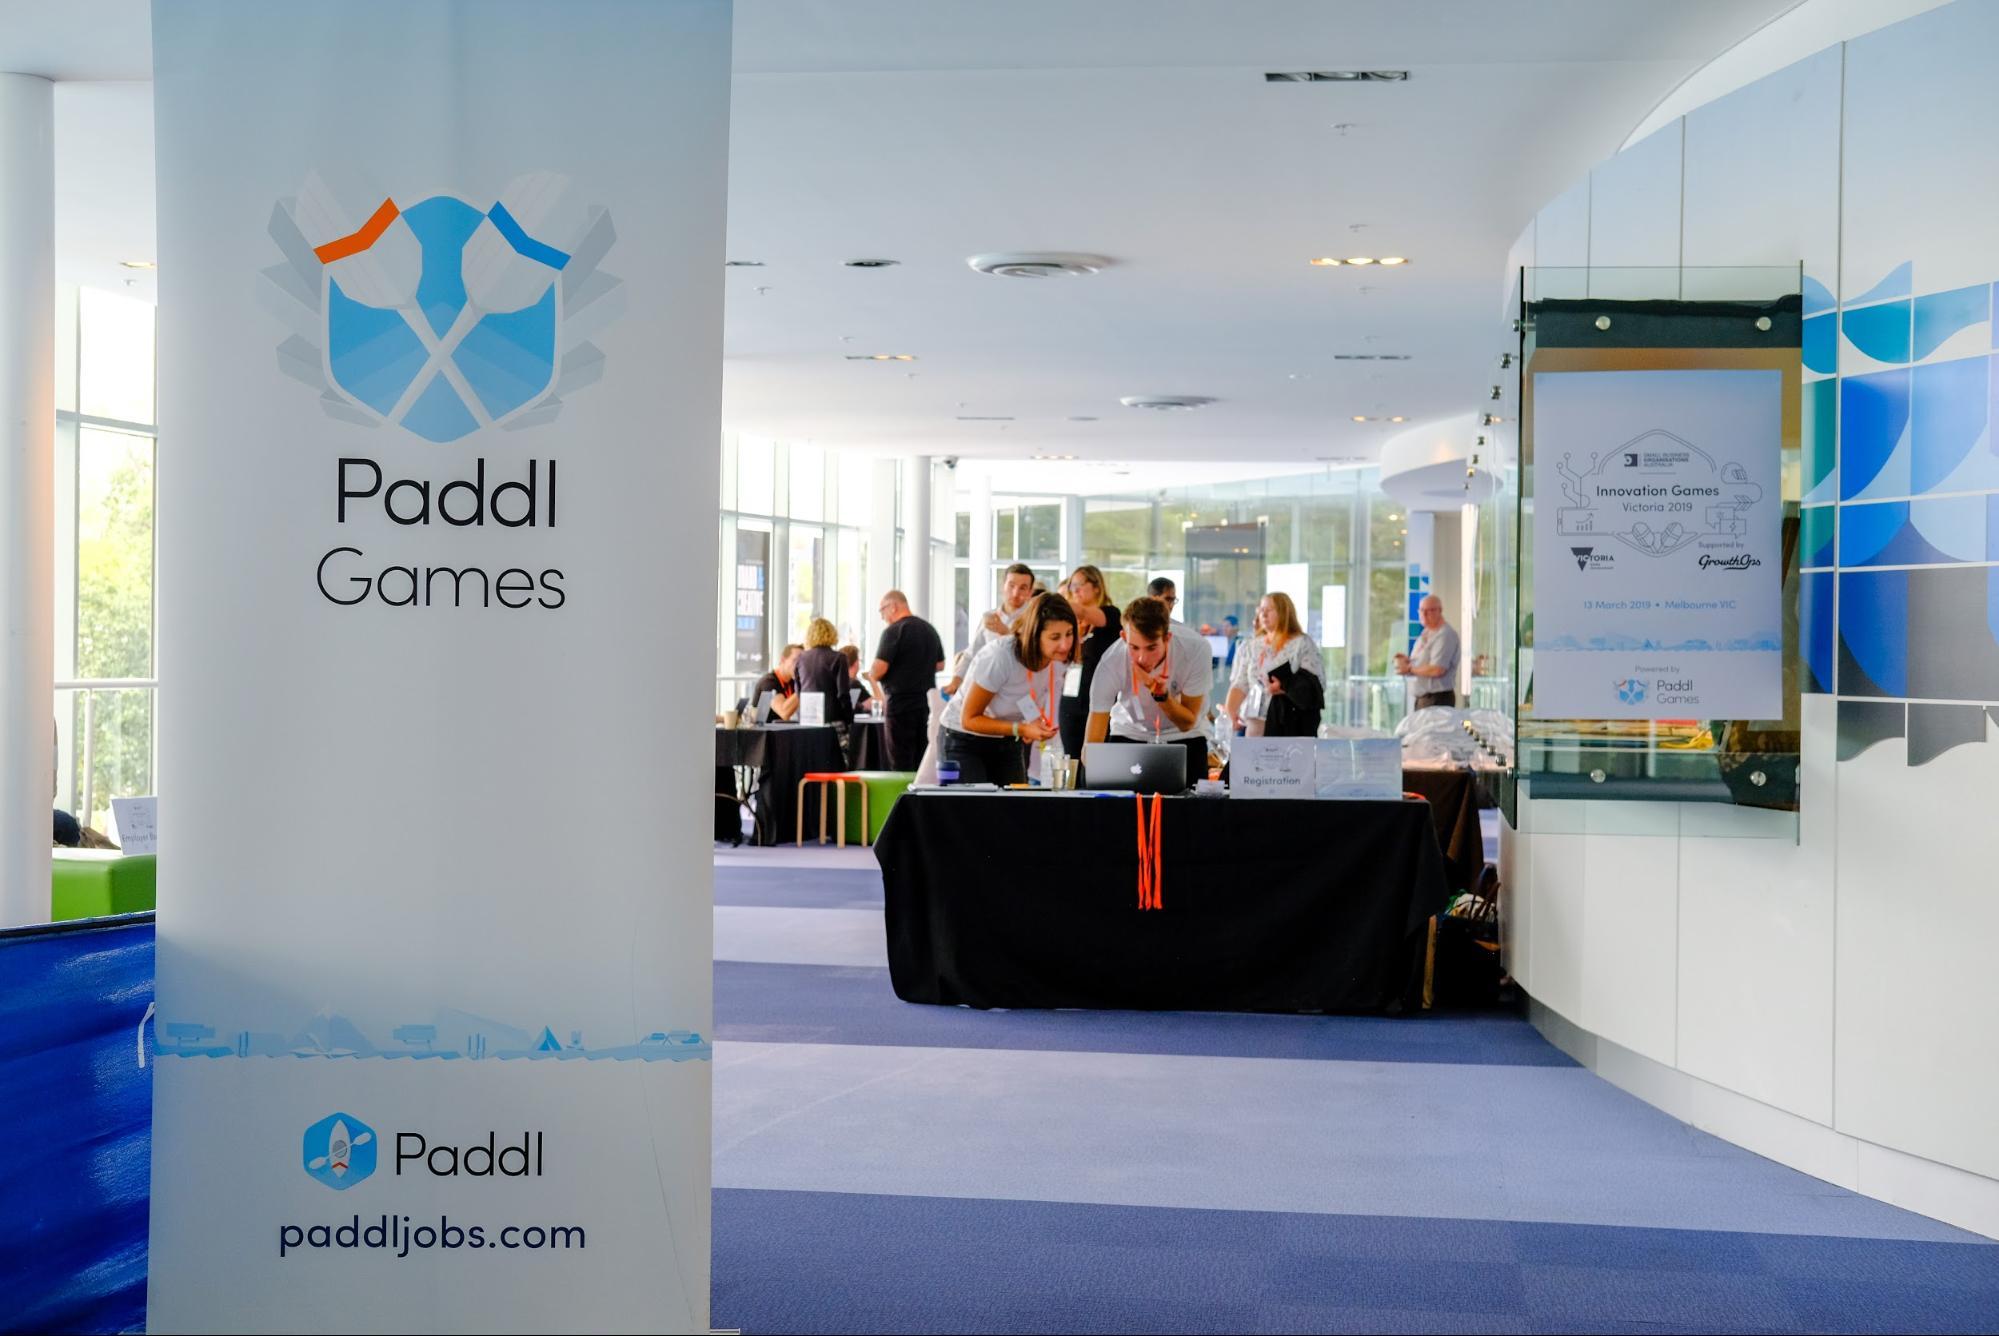 GrowthOps-sponsors-Day-4-COSBOA-Innovation-Games-High-Impact-Innovation.jpg